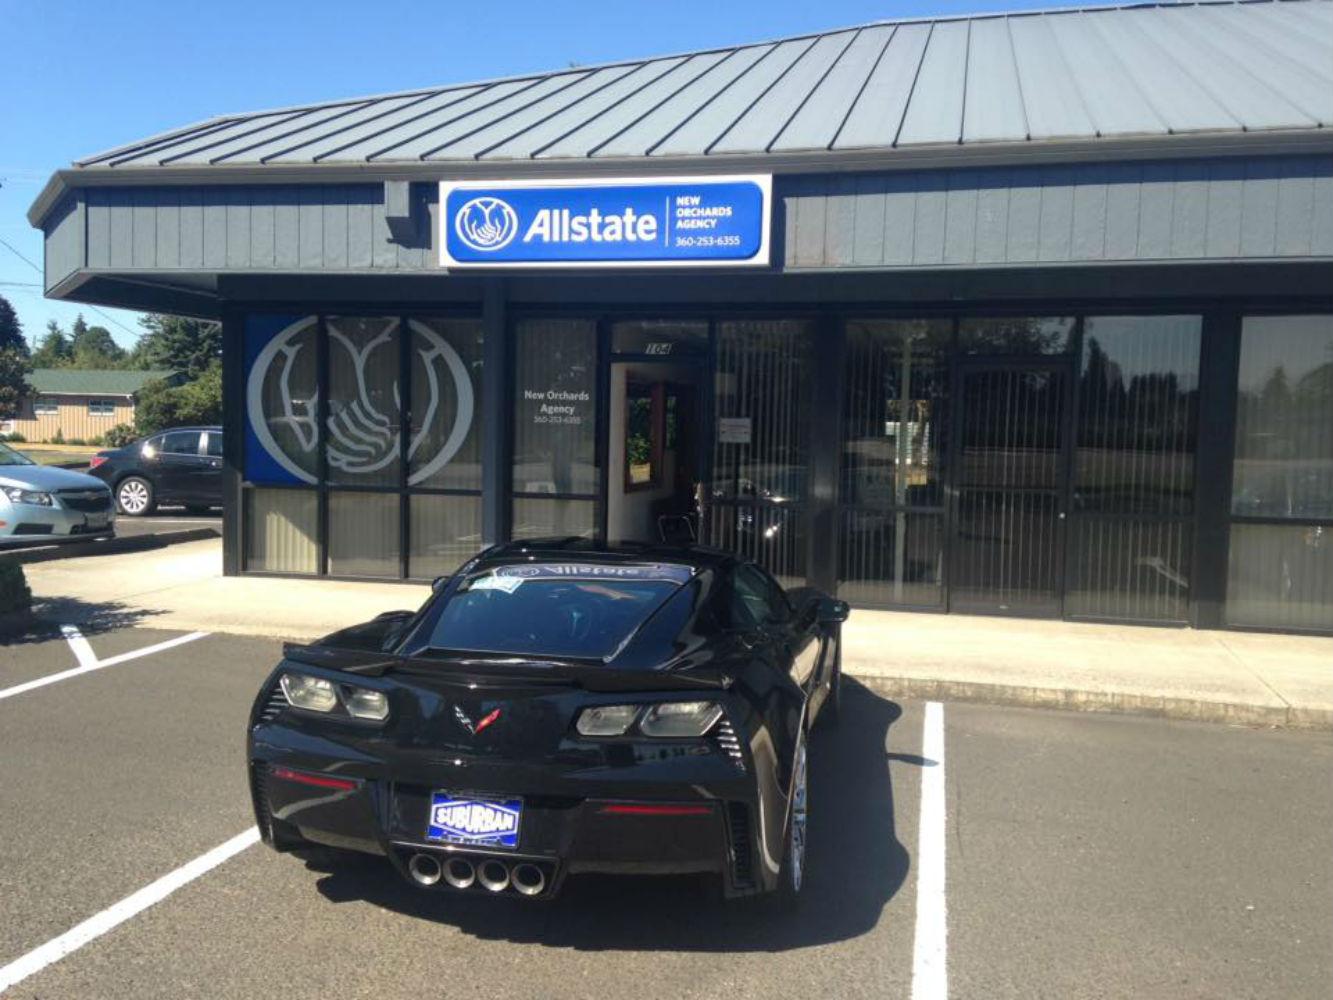 Kevin Saddler: Allstate Insurance image 22